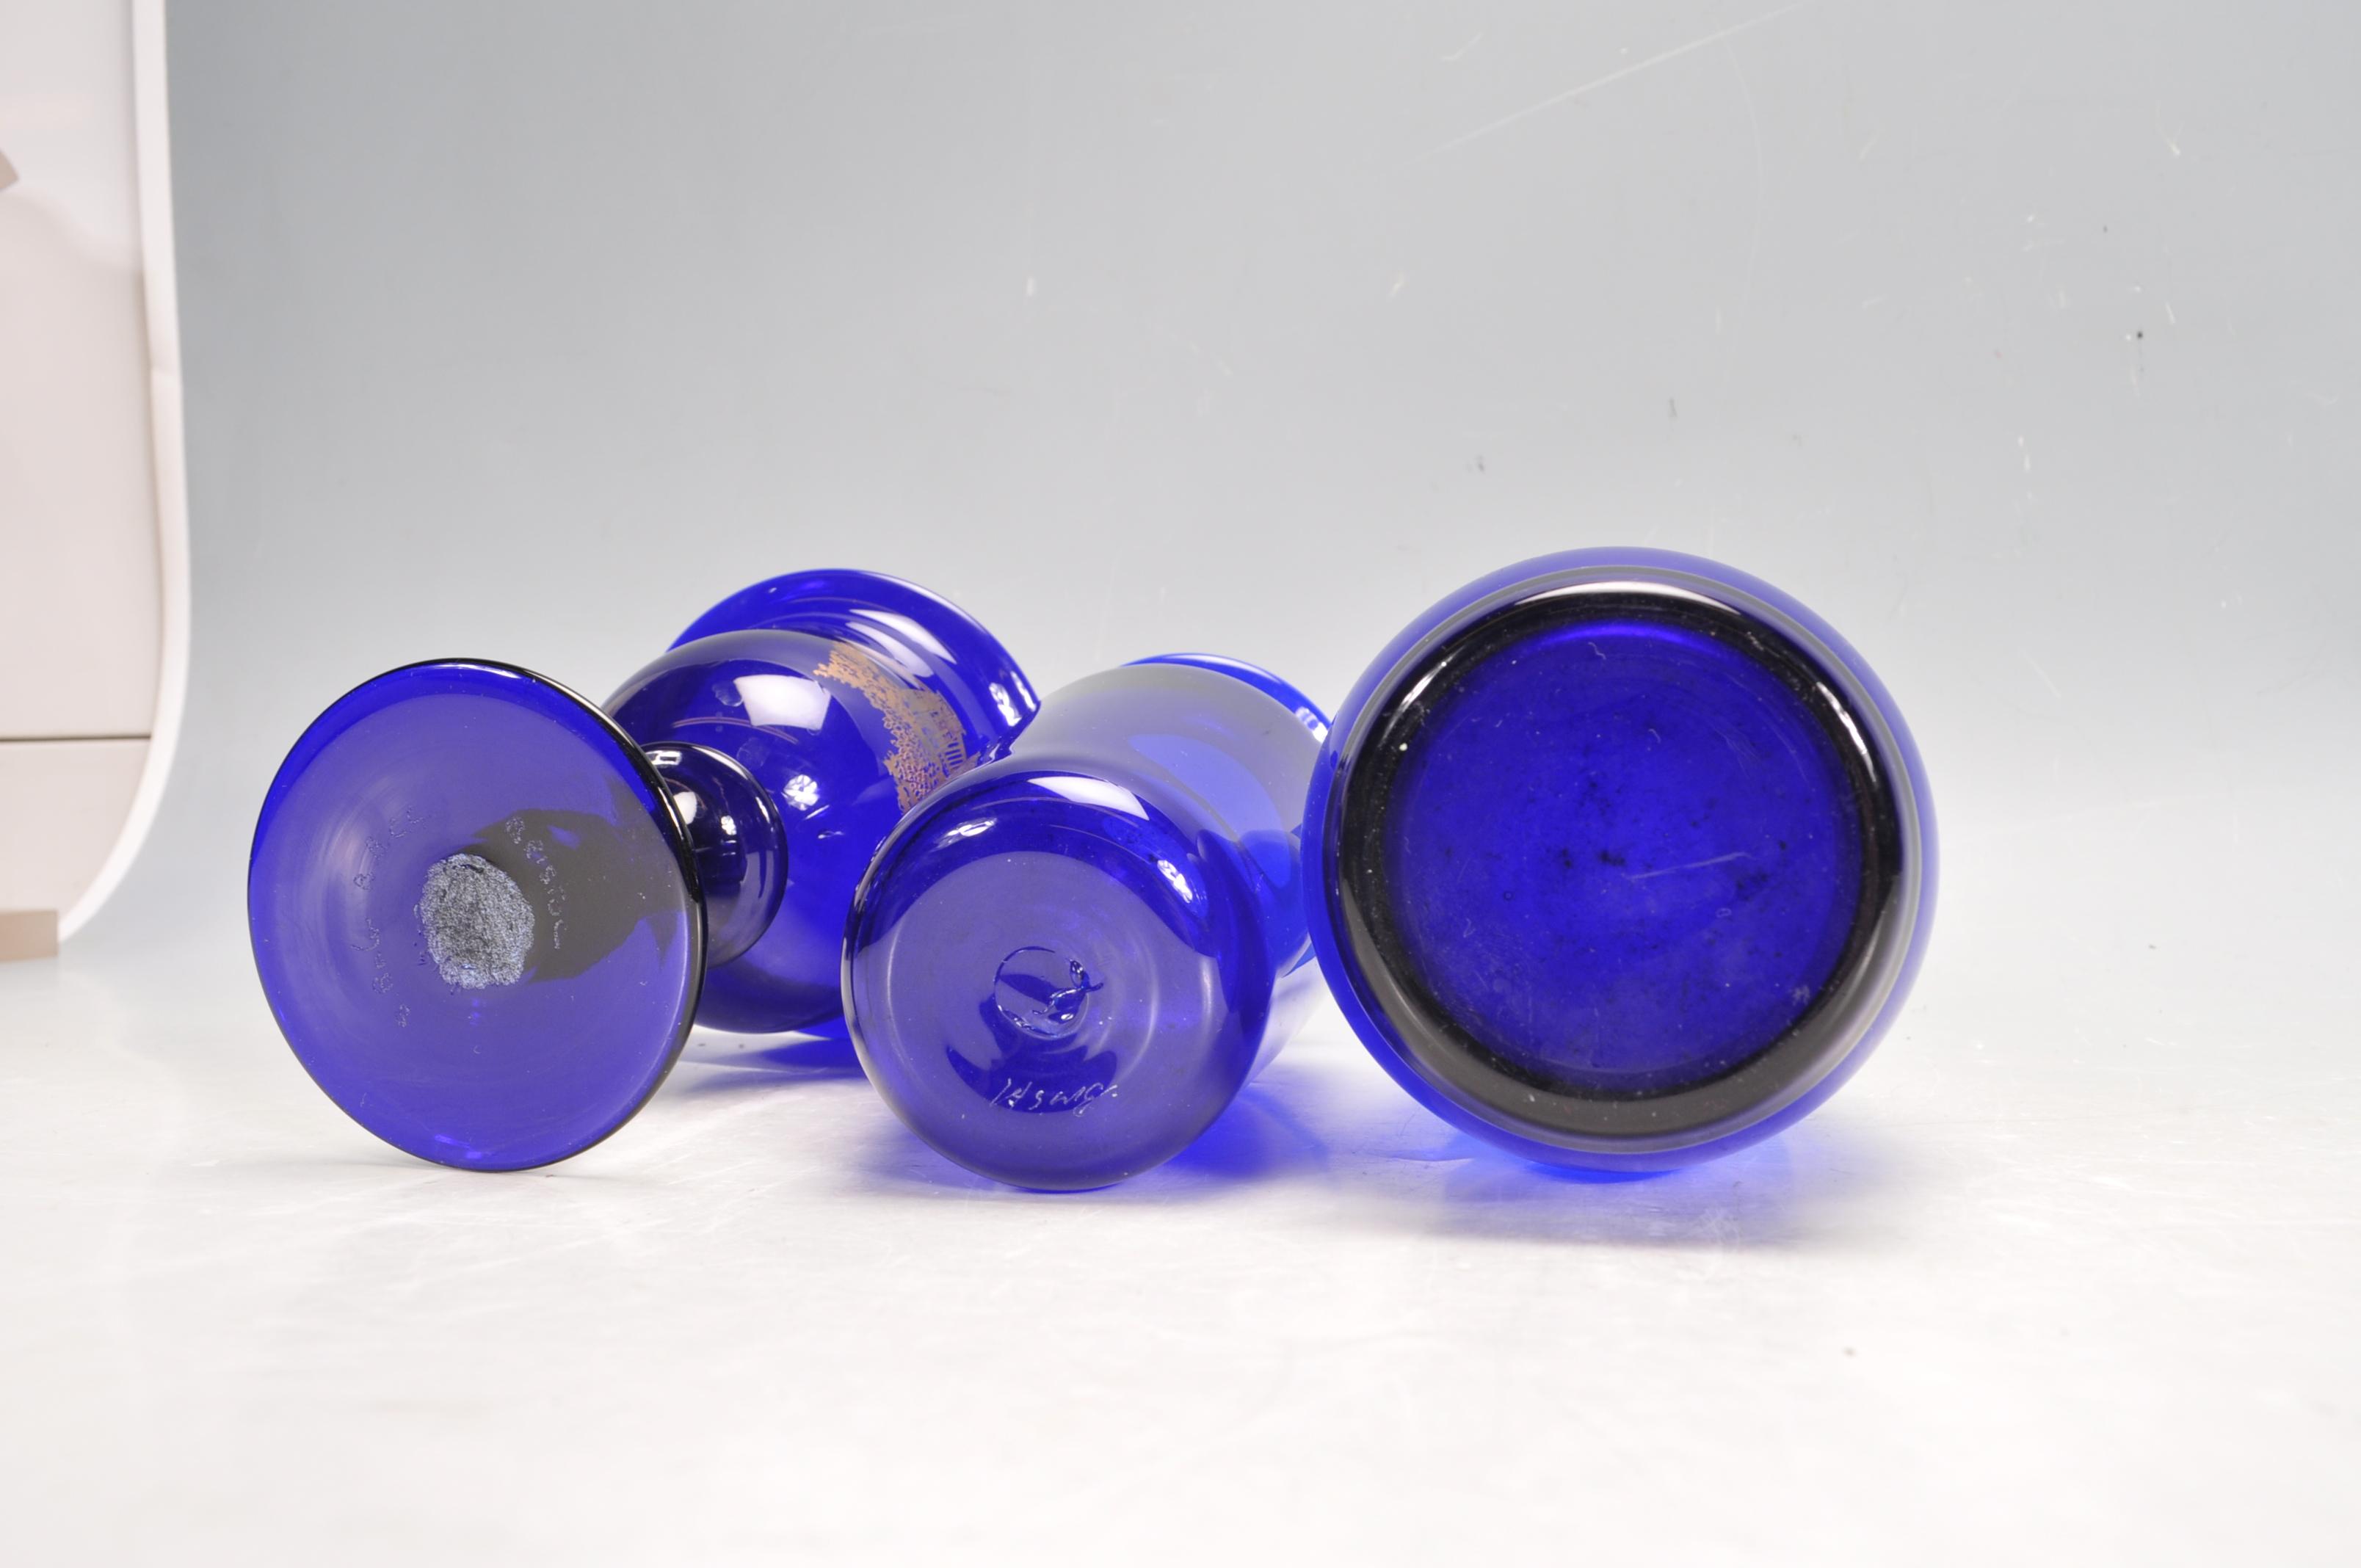 BRISTOL BLUE GLASS ORNAMENTS - Image 19 of 34